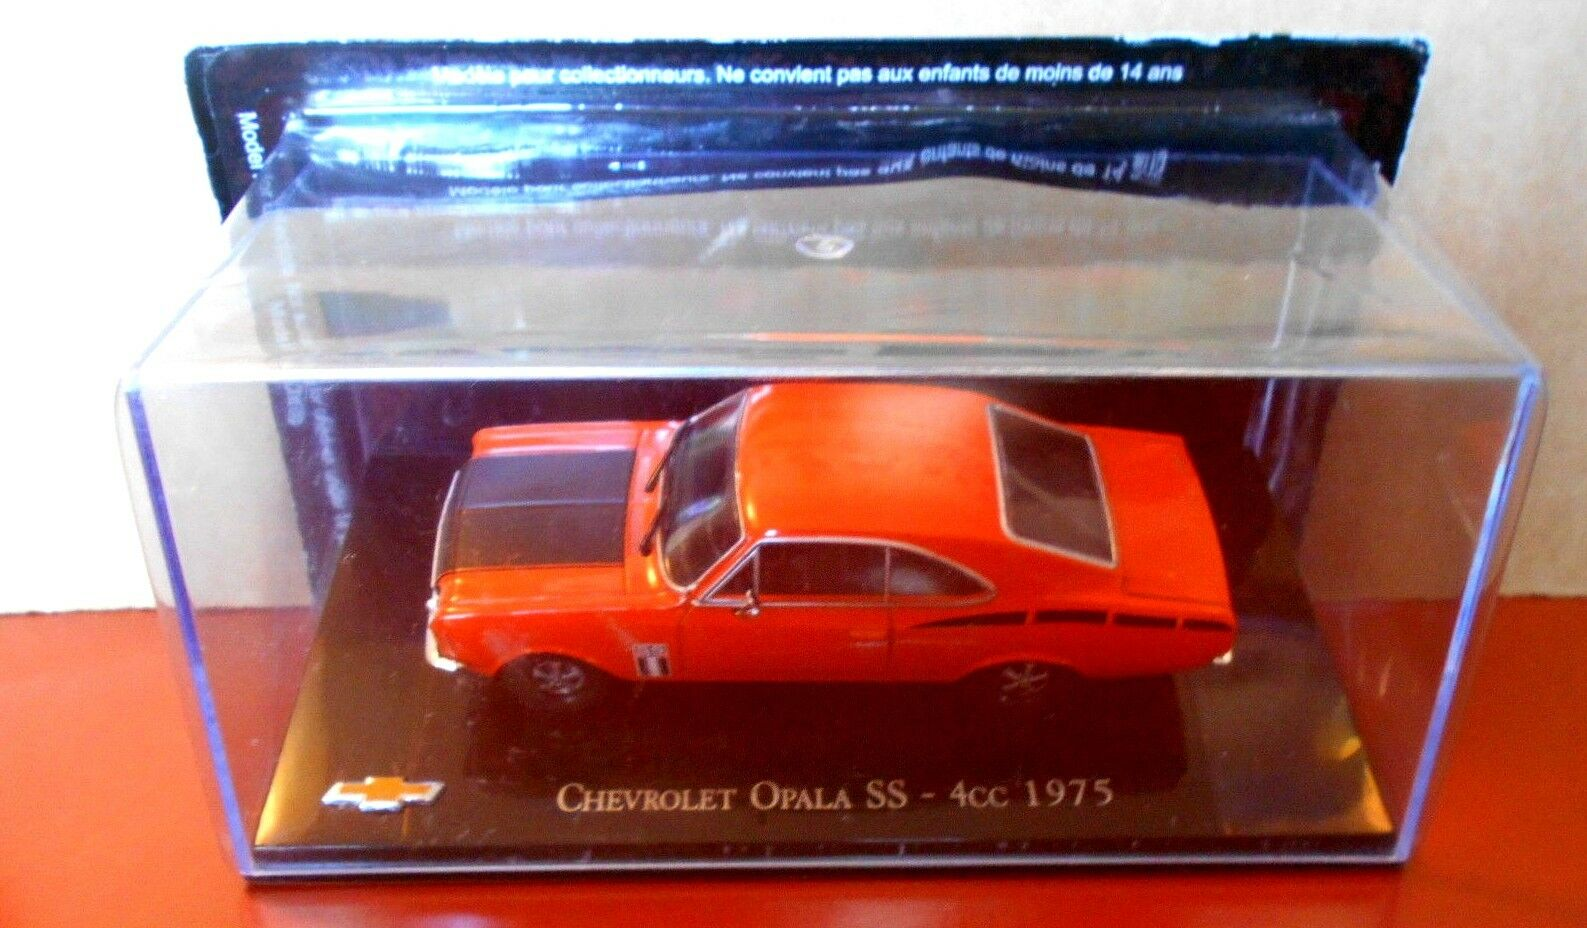 "MUERE EL MOLDE "" CHEVROLET OPALA SS - 4cc - - - 1975 ESCALA 1 43  calidad de primera clase"